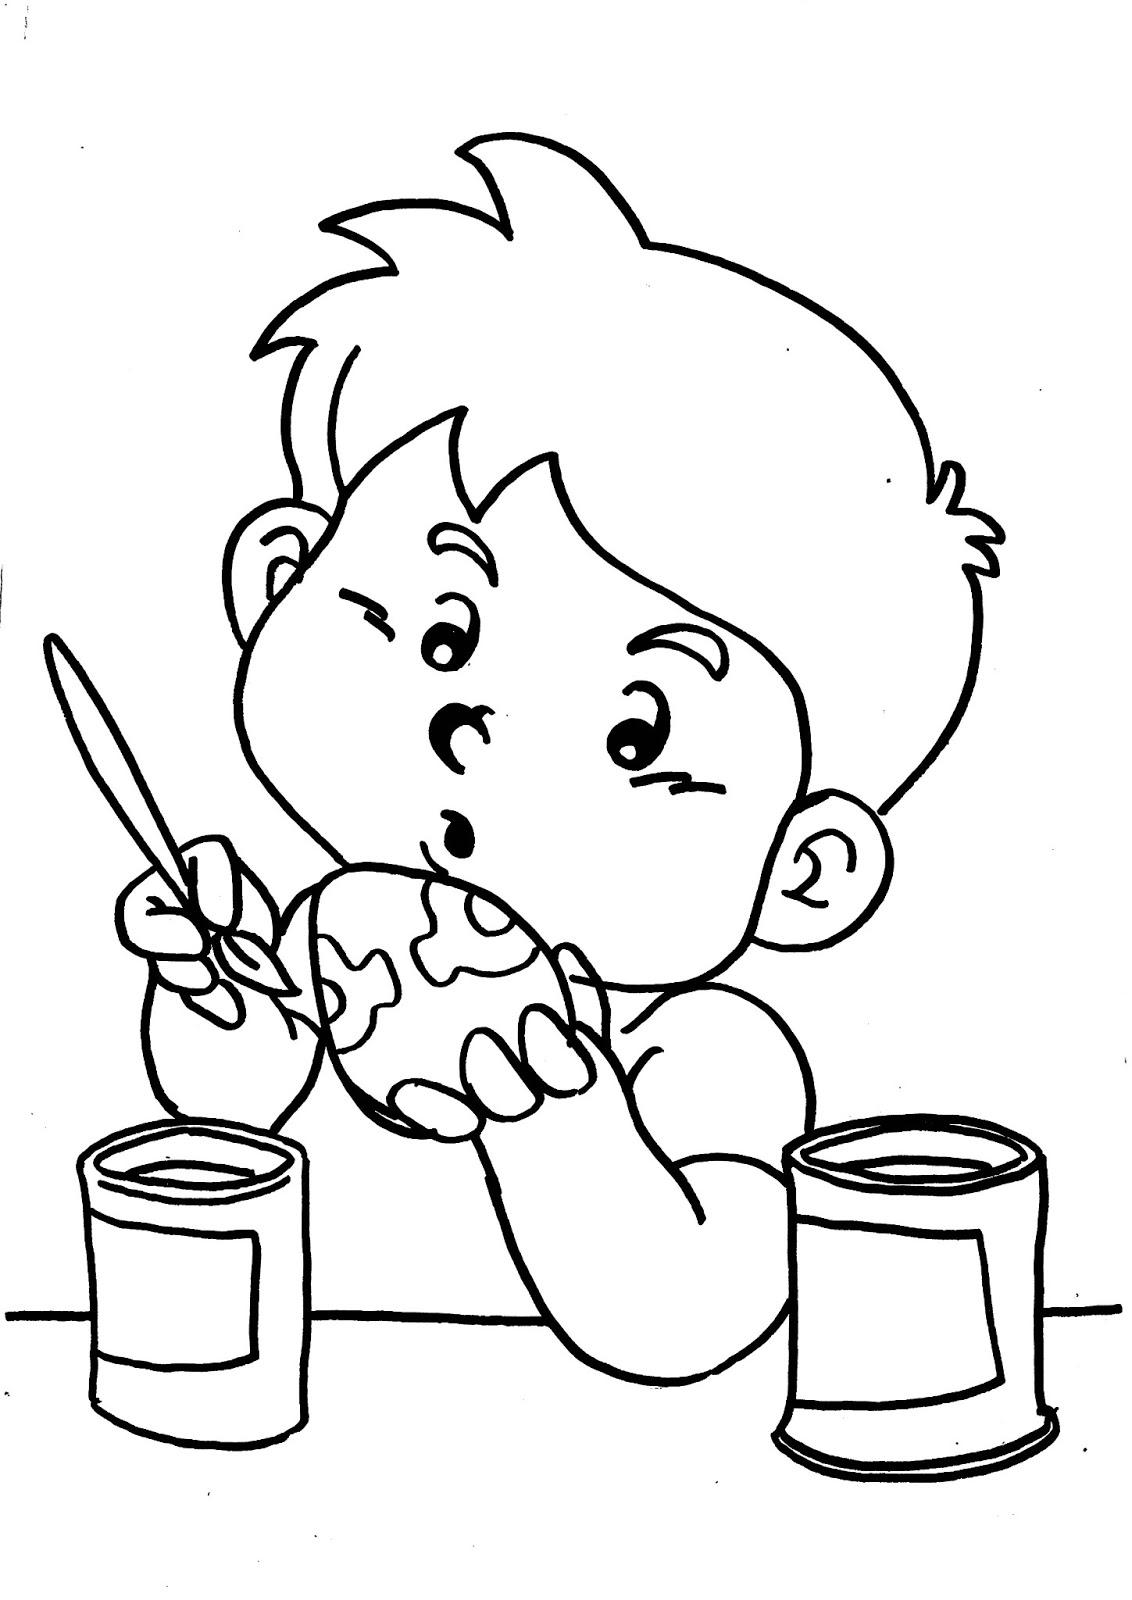 COLOREA TUS DIBUJOS: Dibujo de como decorar un huevo de pascua para ...